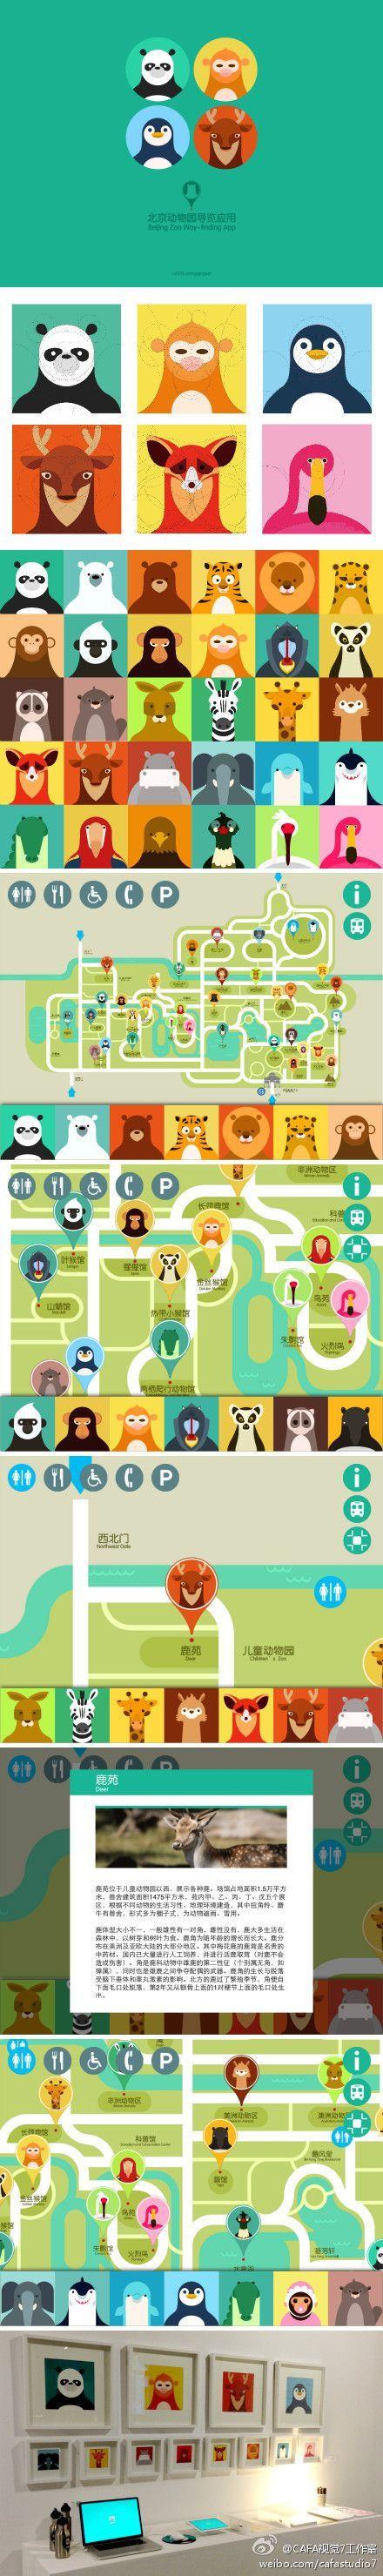 "Graduate design [7] ""Beijing Zoo navigation application ... @ pockyday collected favorite icon (Figure 17) _ petals UI design:"